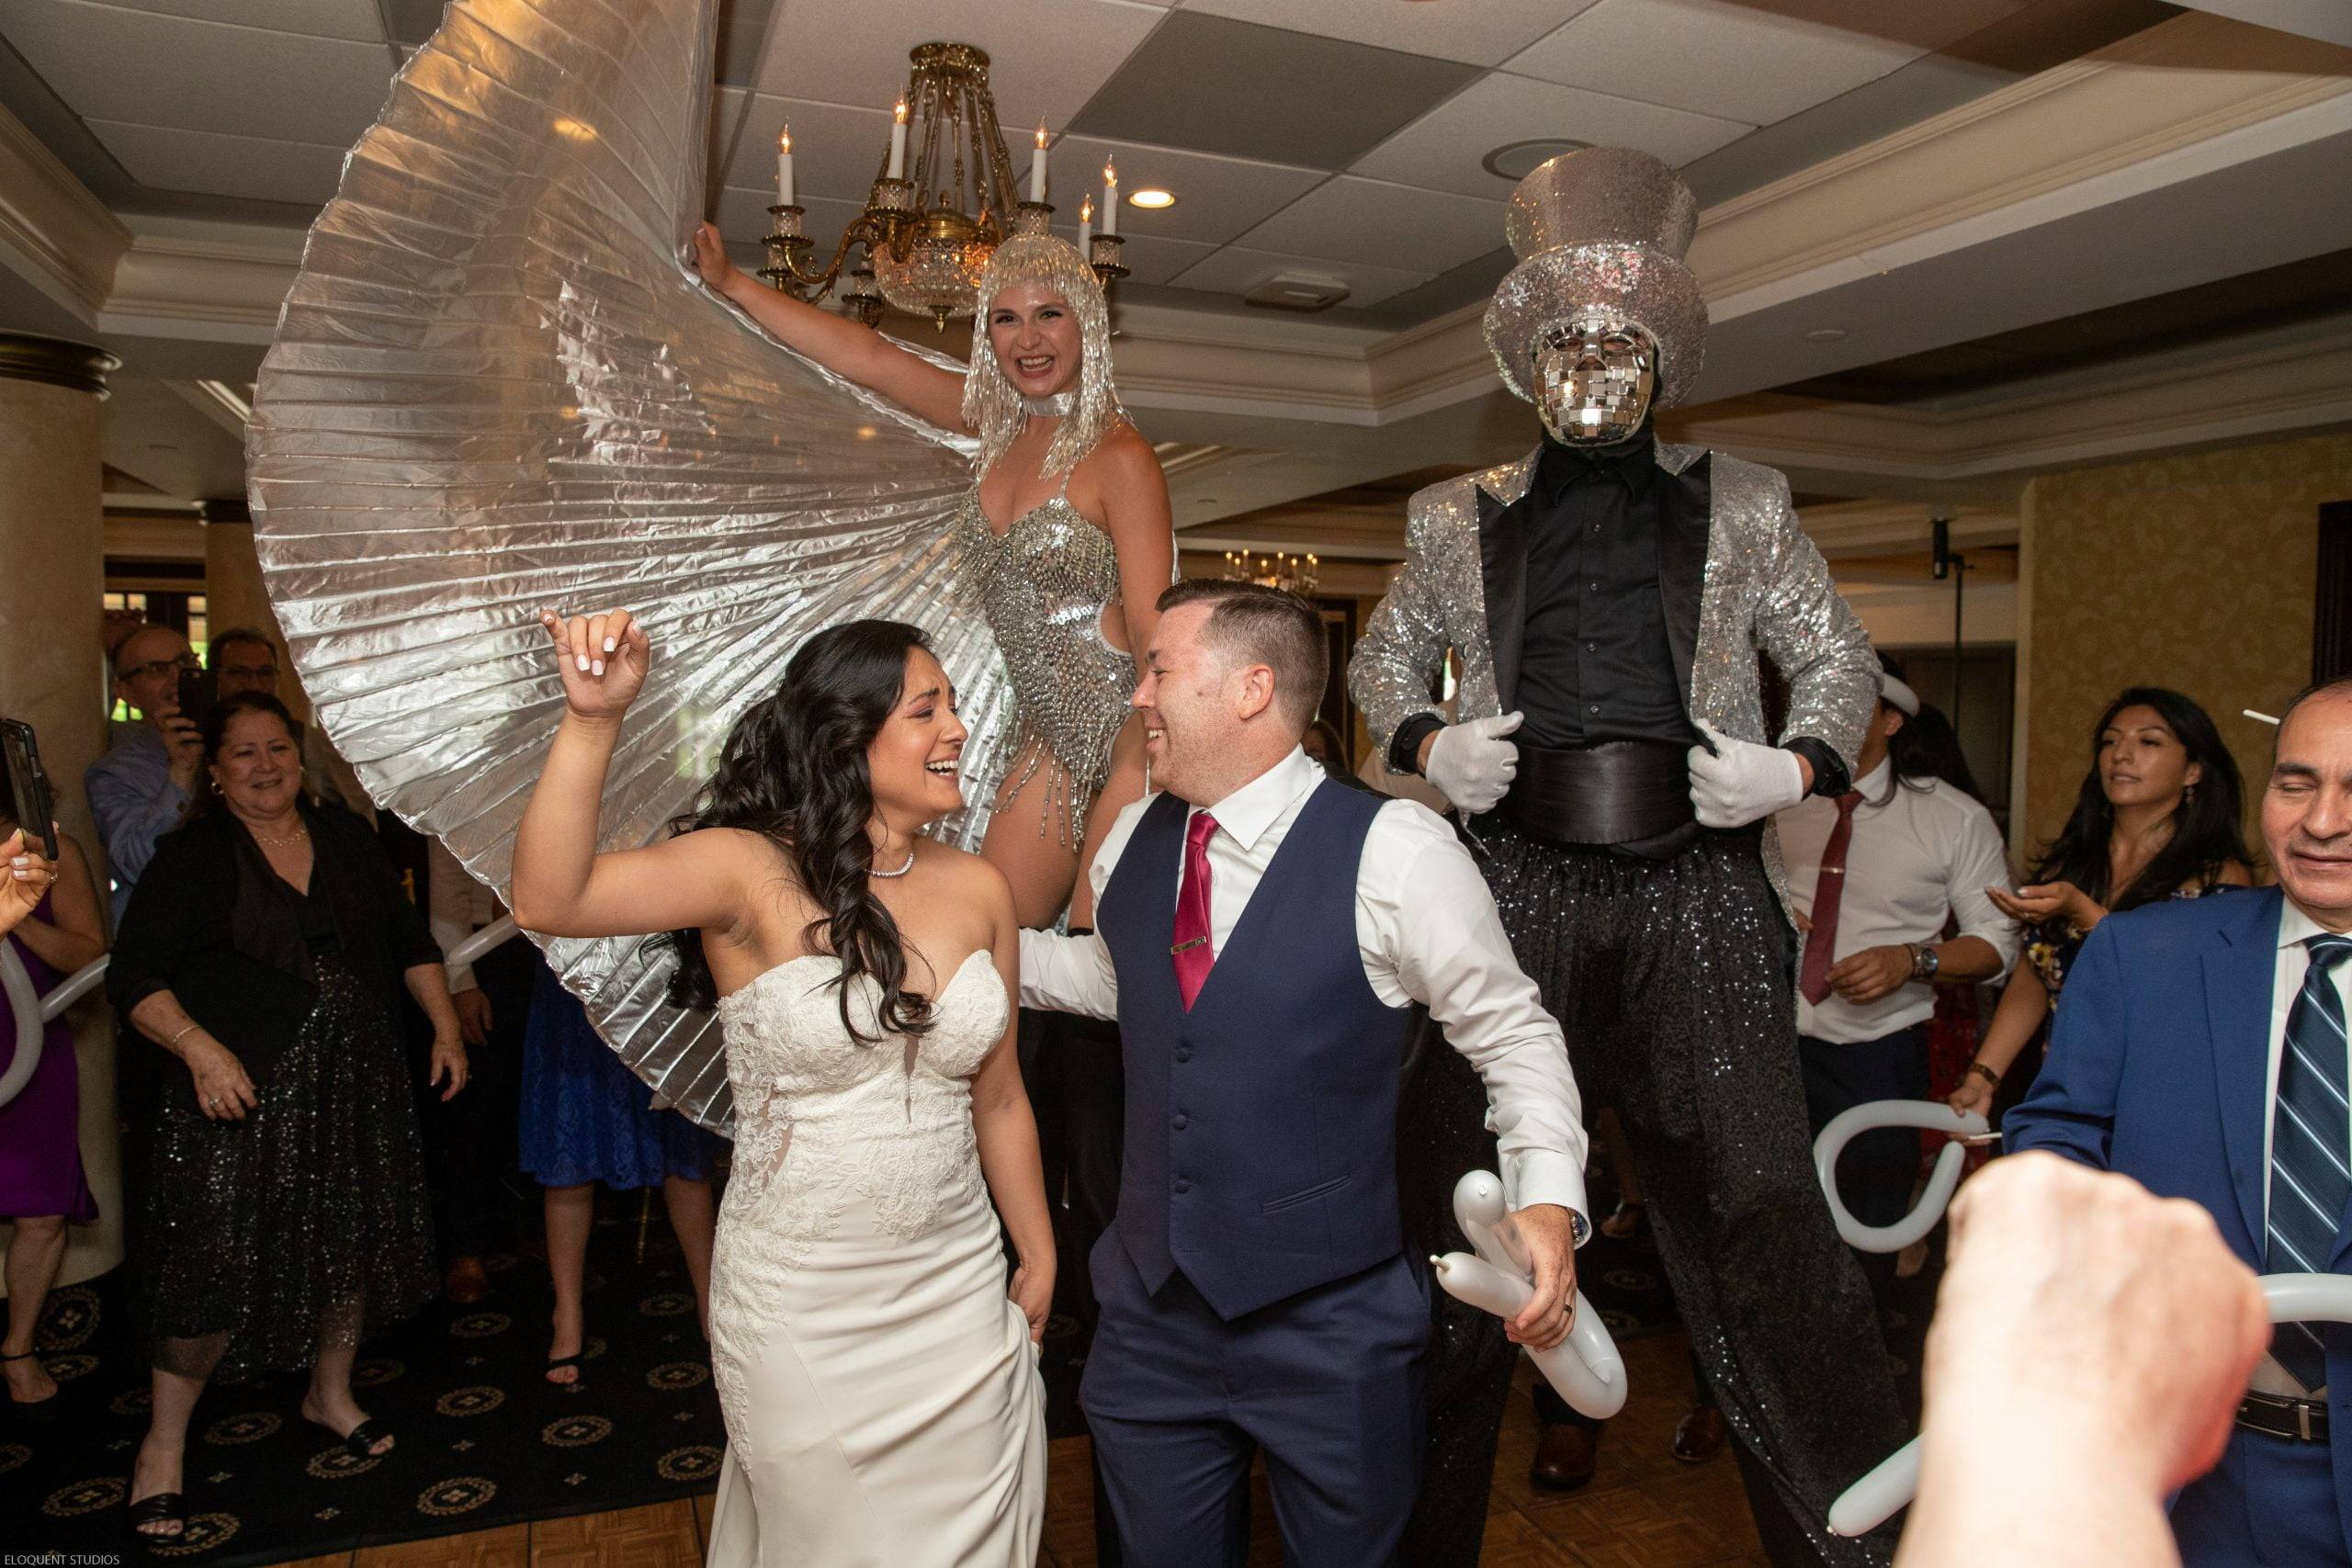 Brooklake bride and groom on dance floor with stilt walkers